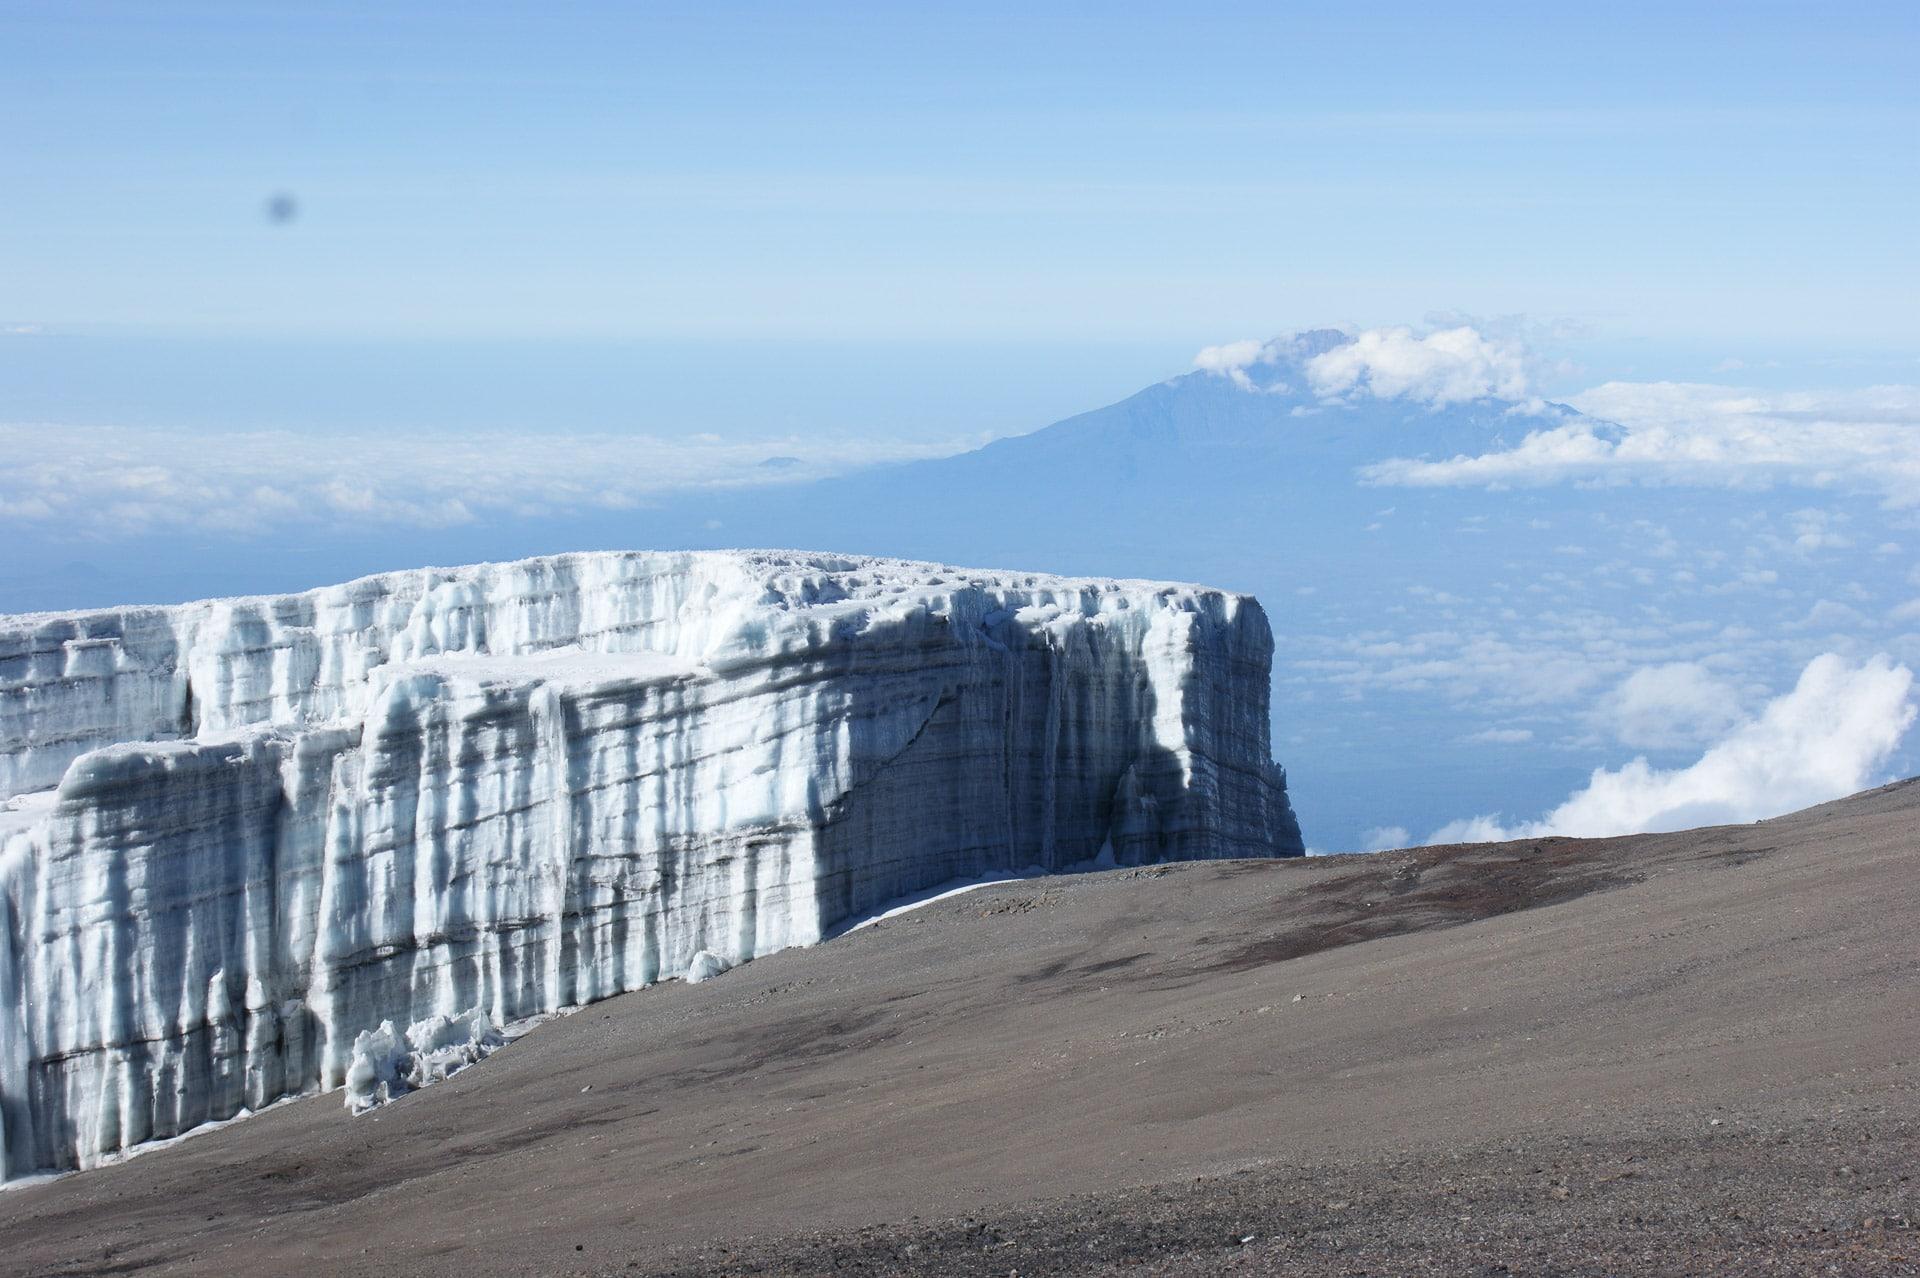 Kilimanjaro-Tansania-Globetrotter-Select-Krause-12